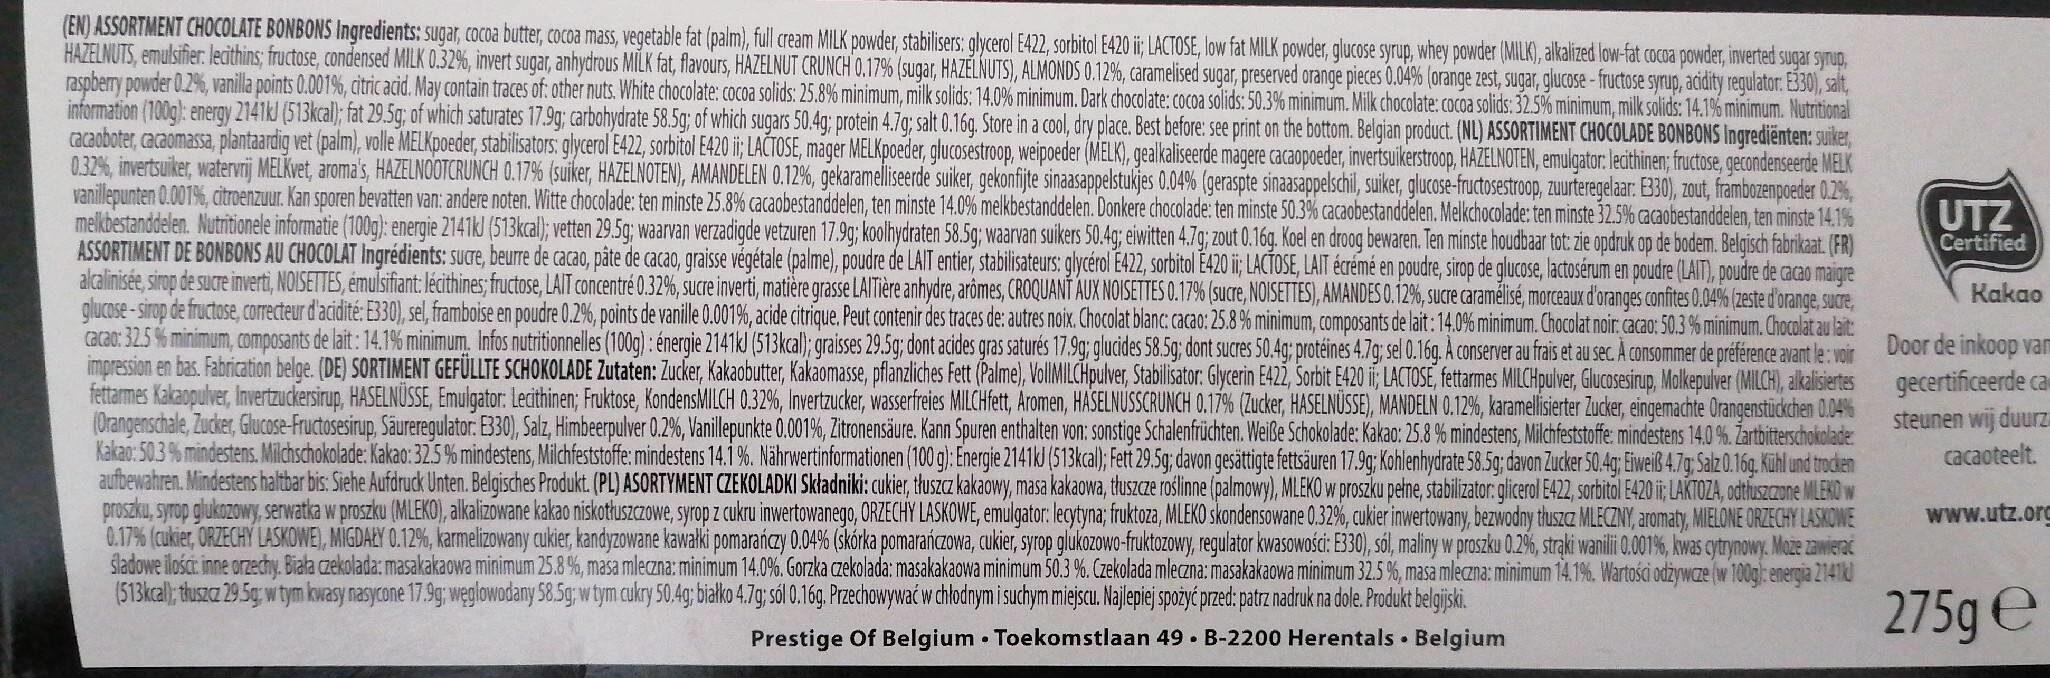 Prestige of belgium - Nutrition facts